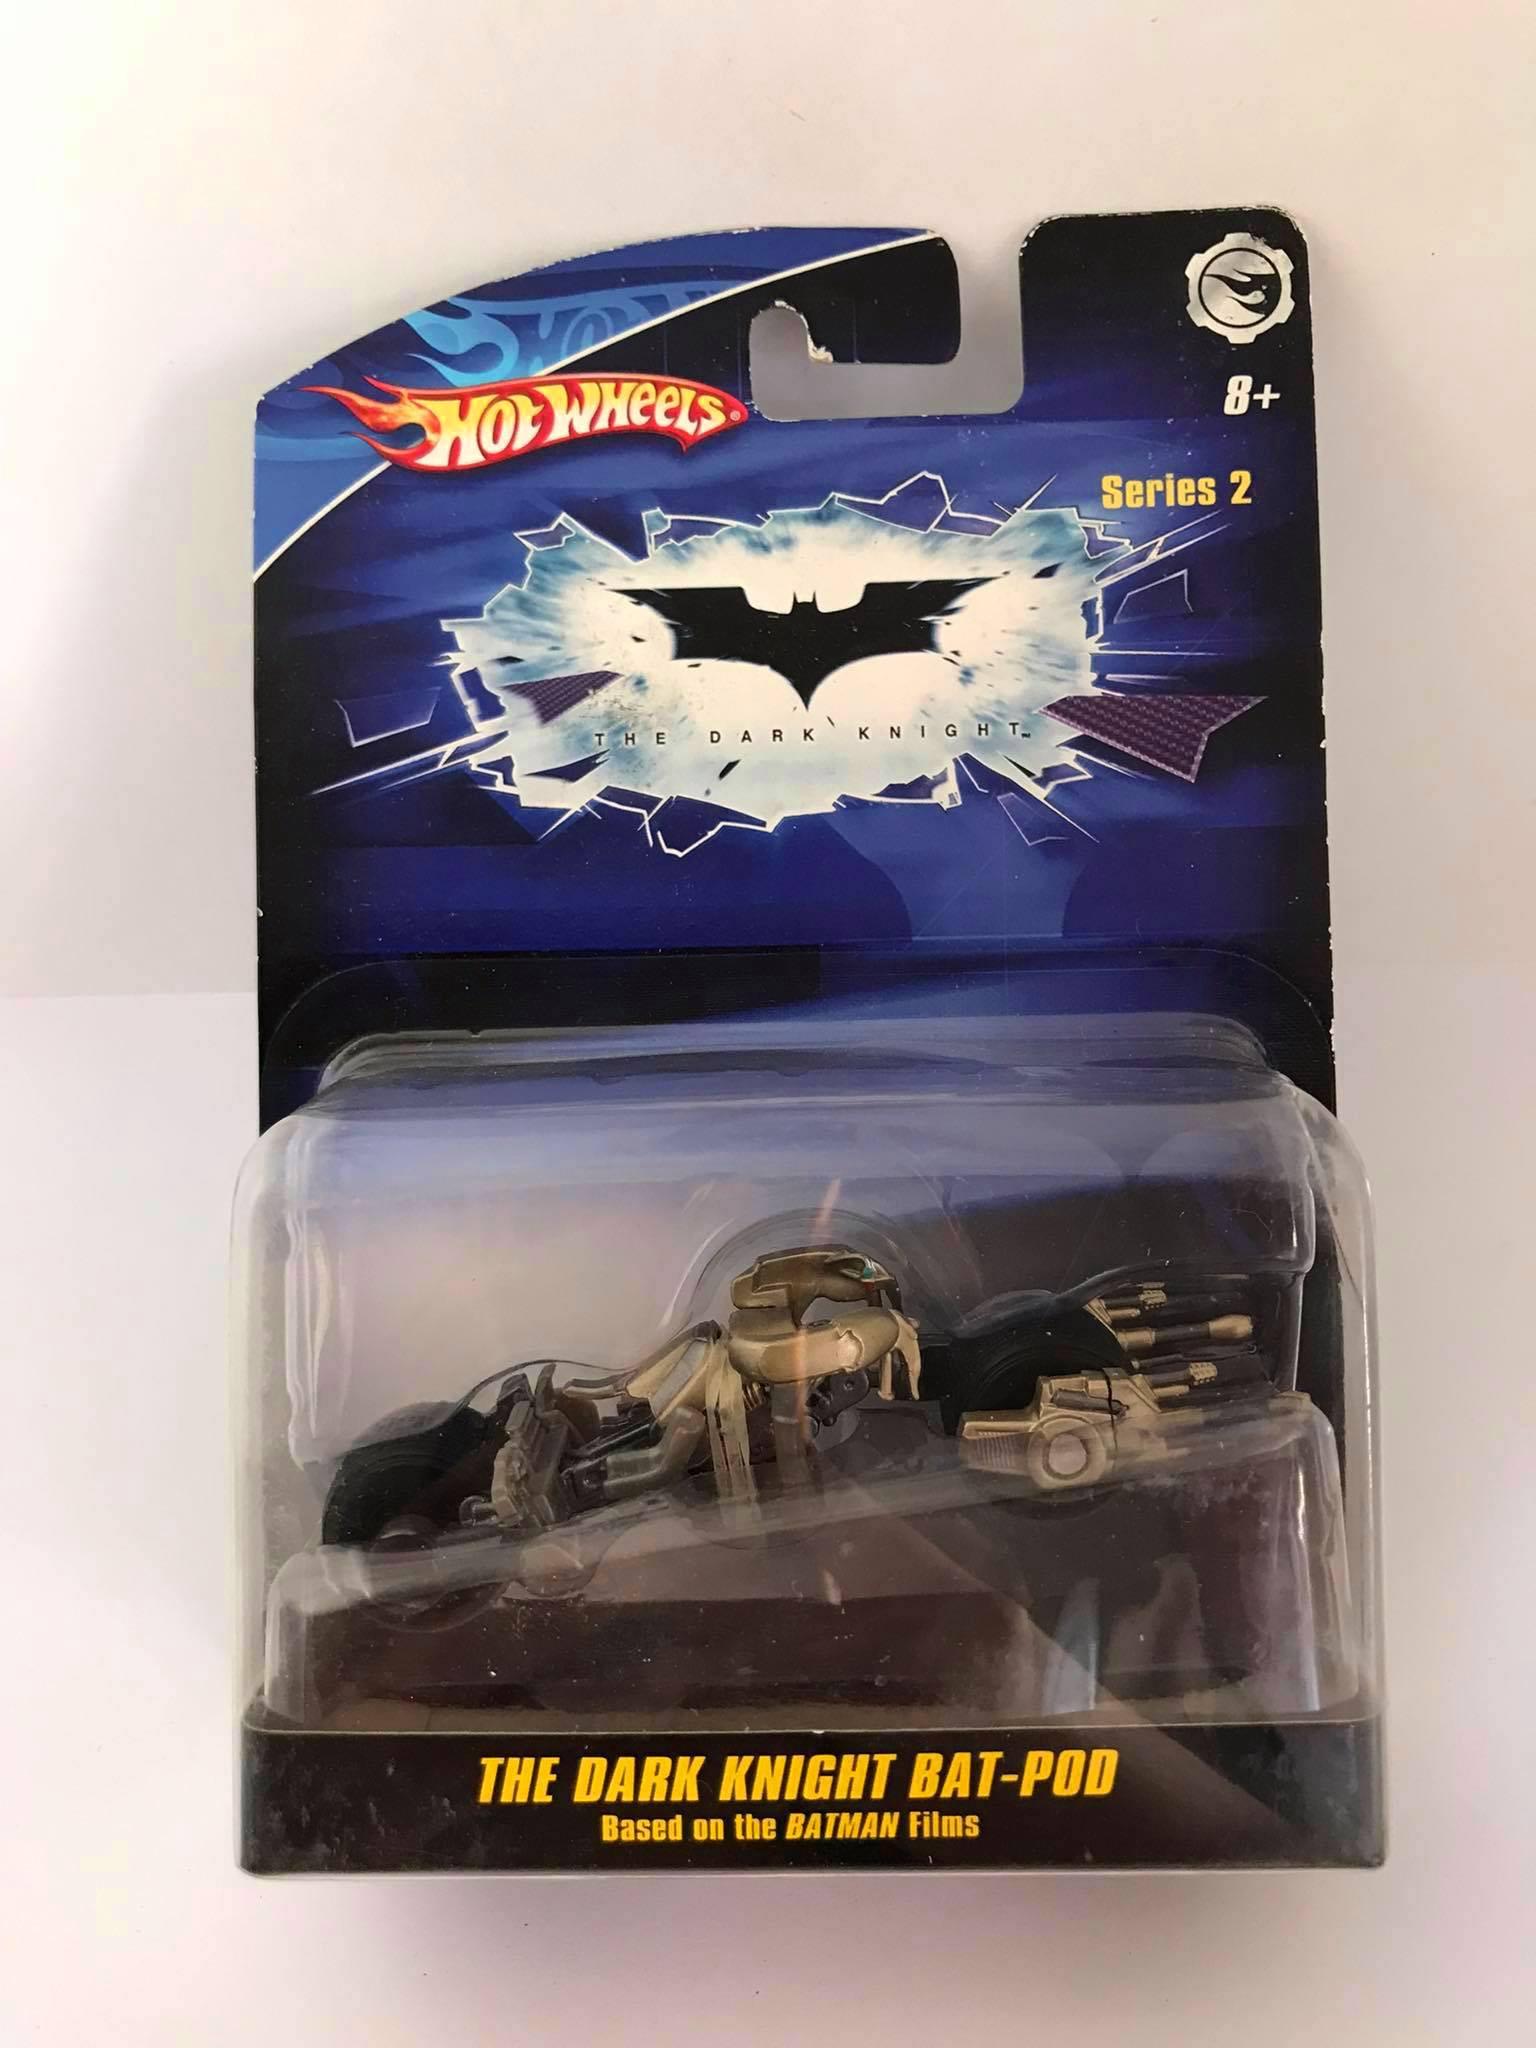 Hot Wheels - The Dark Knight Bat-Pod Based on The Batman Films - The Dark Knight - Escala 1:50